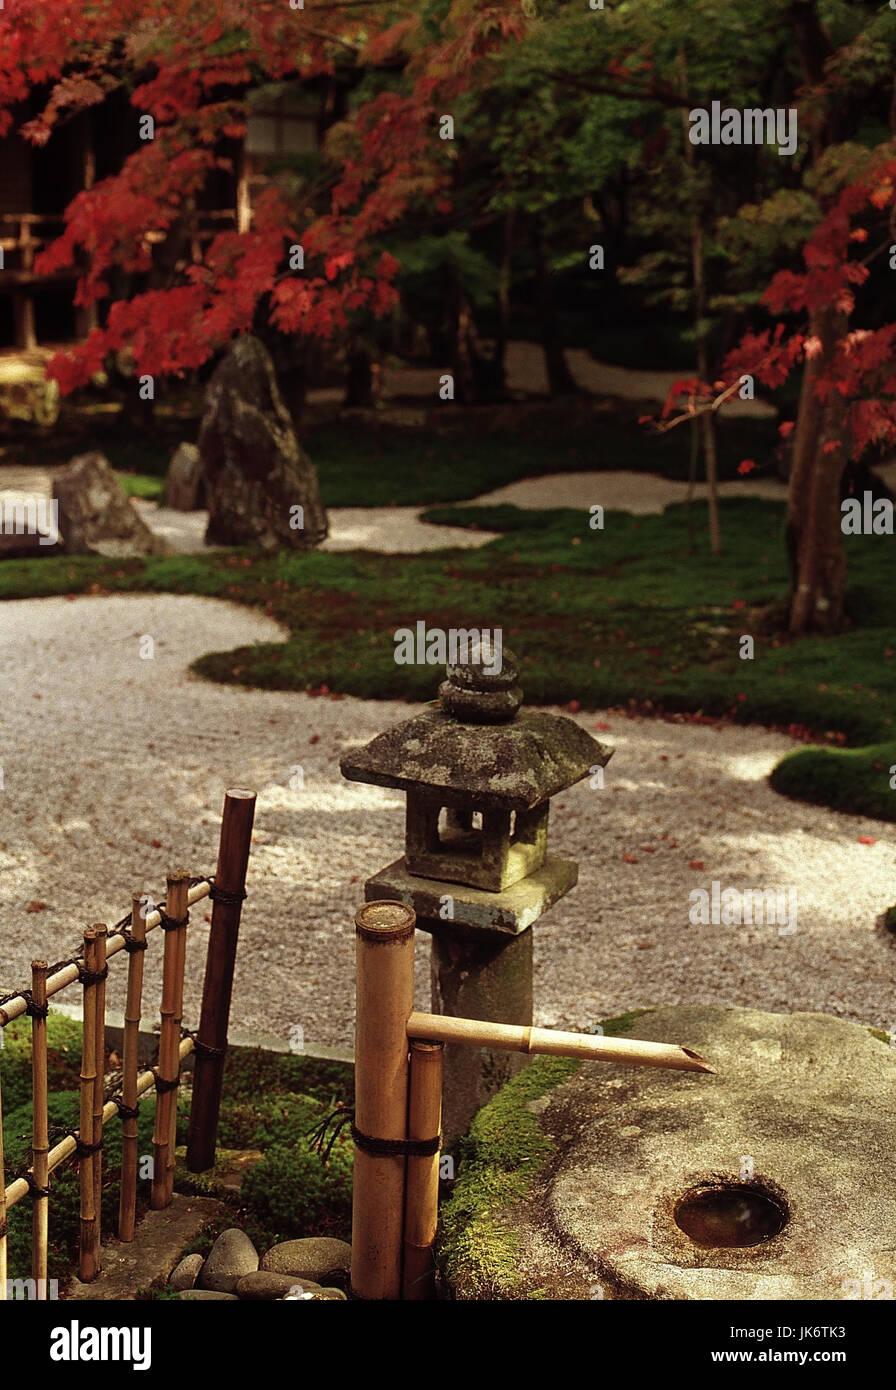 Japan, Kyushu, Dazaifu, Komiyo-ji  Tempel,  Ittekikaino-niwa Garten  innen, Fukuoka-ken, Komiyoji, Lebensart, japanisch, - Stock Image